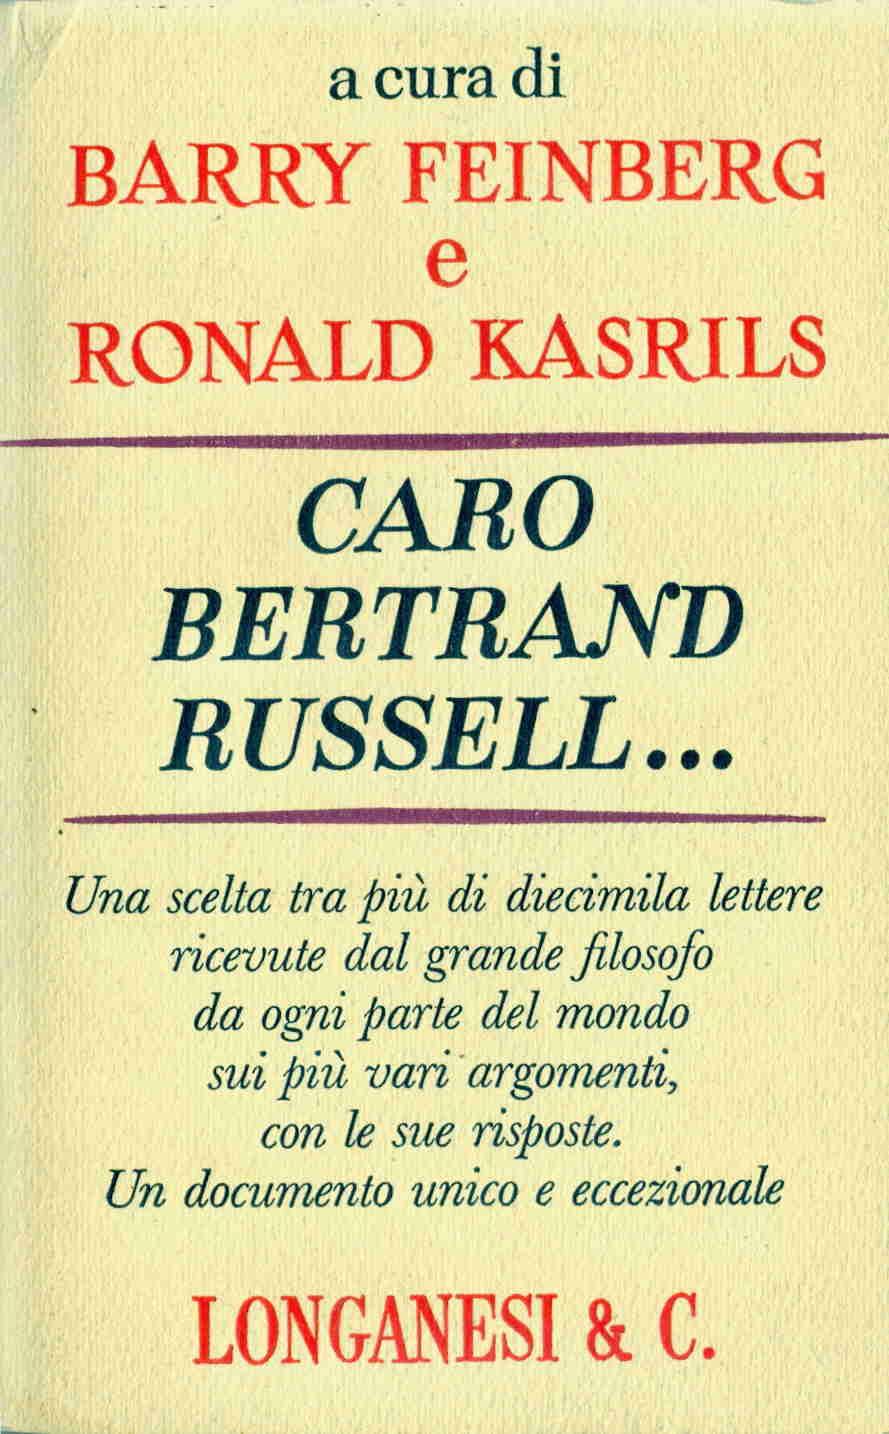 Caro Bertrand Russell...